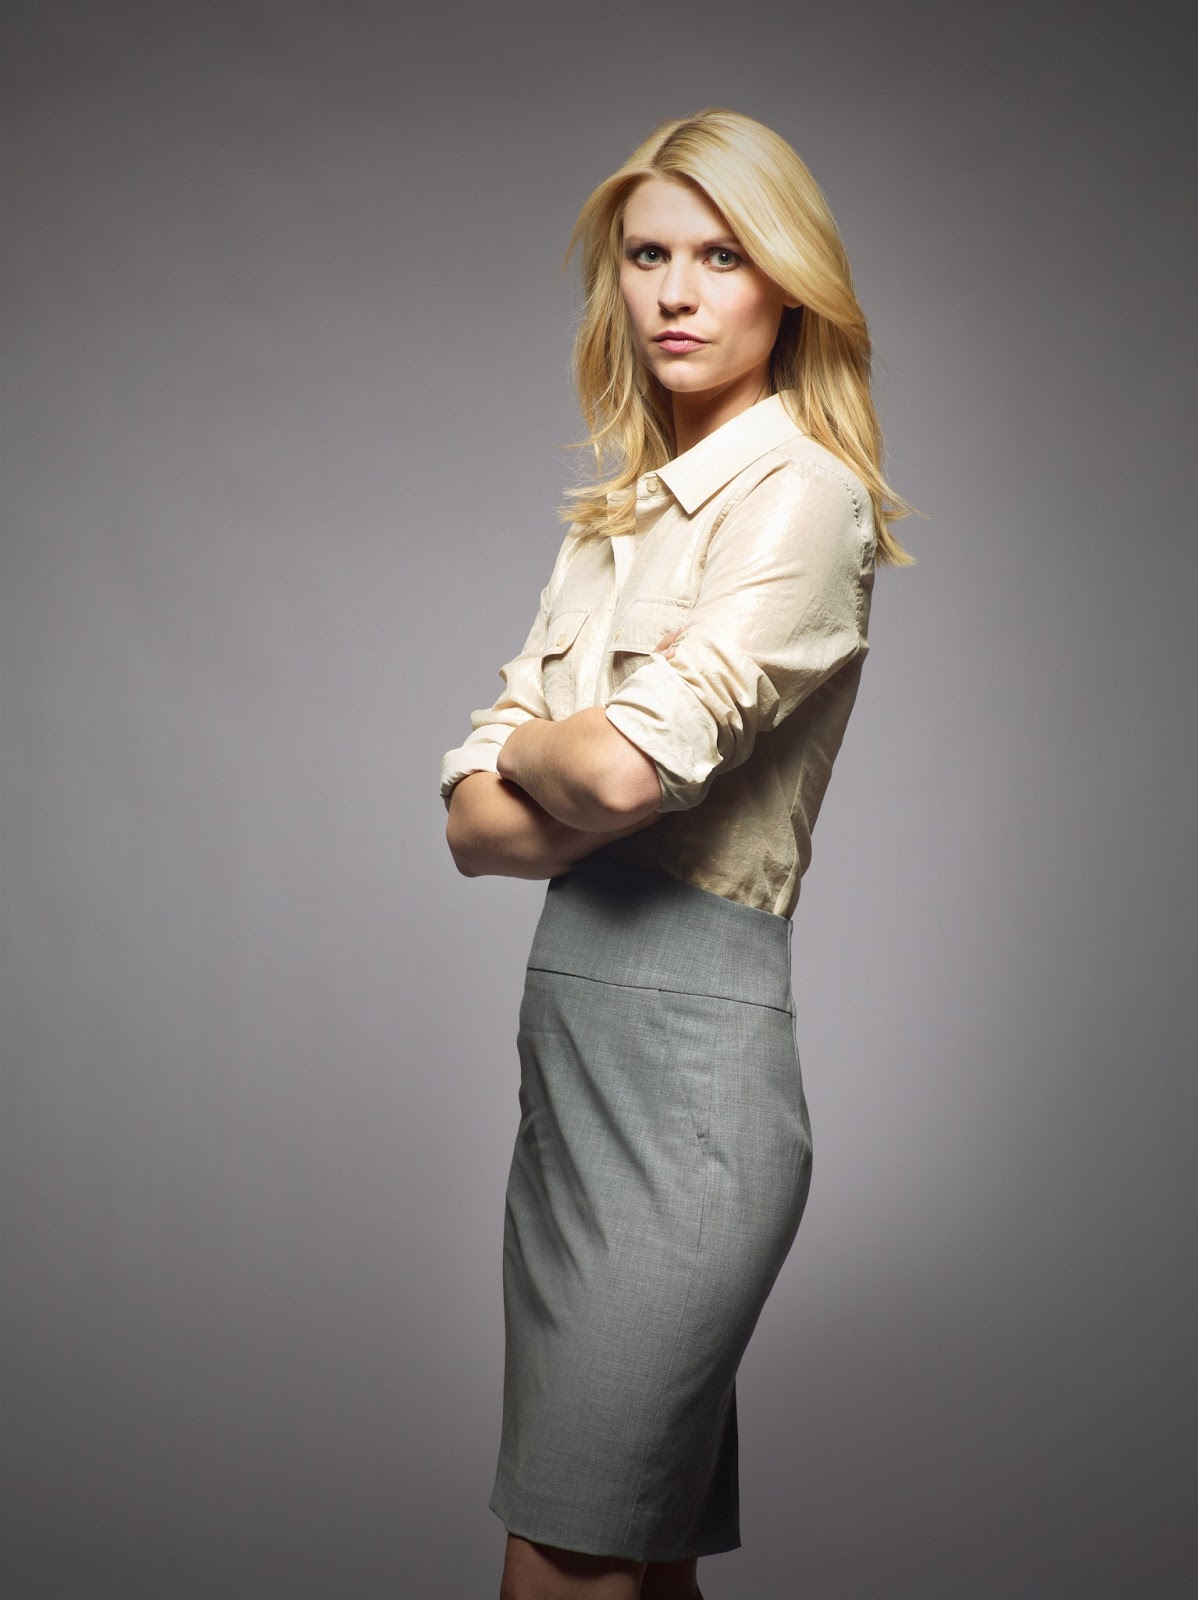 aboutnicigiri: Claire ... Claire Danes Homeland